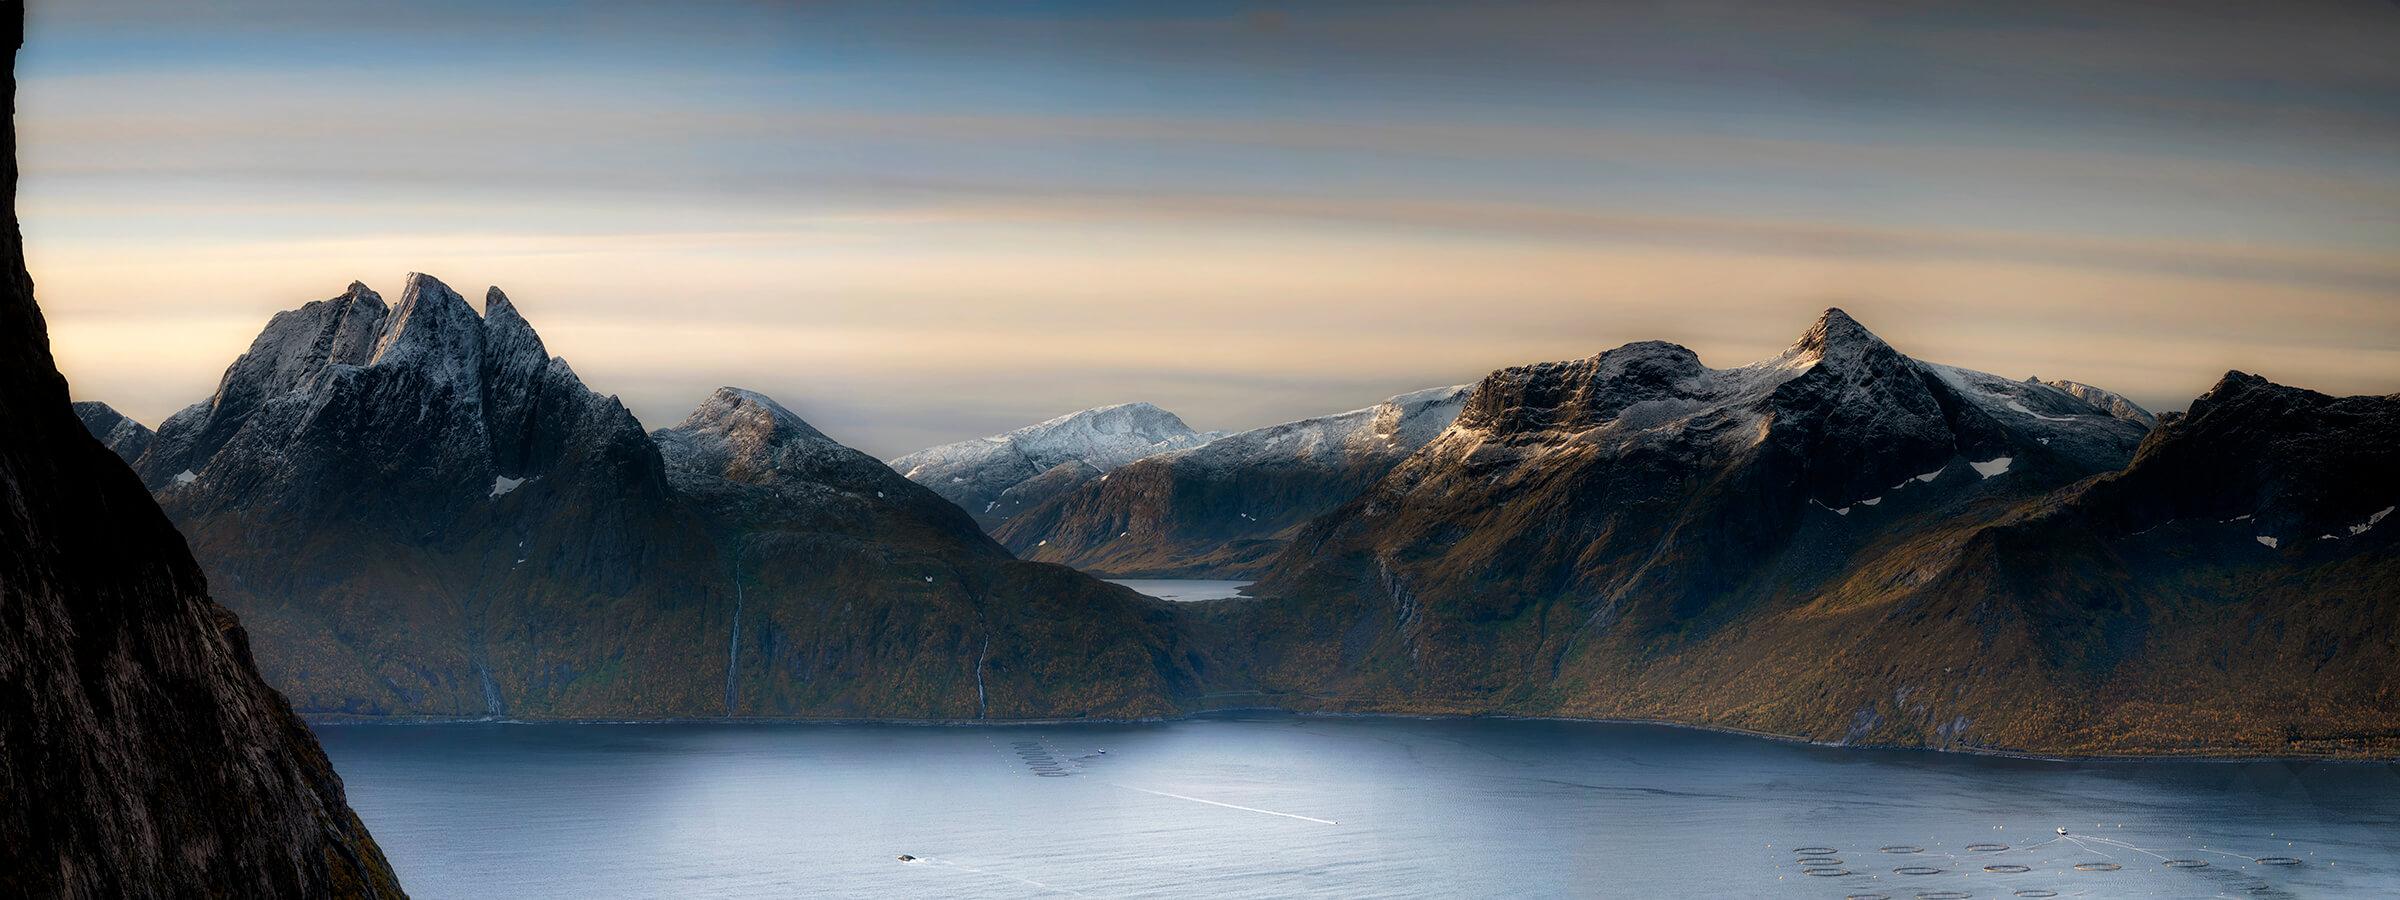 Mountain panorama photo, Segla Norway by Joakim Jormelin